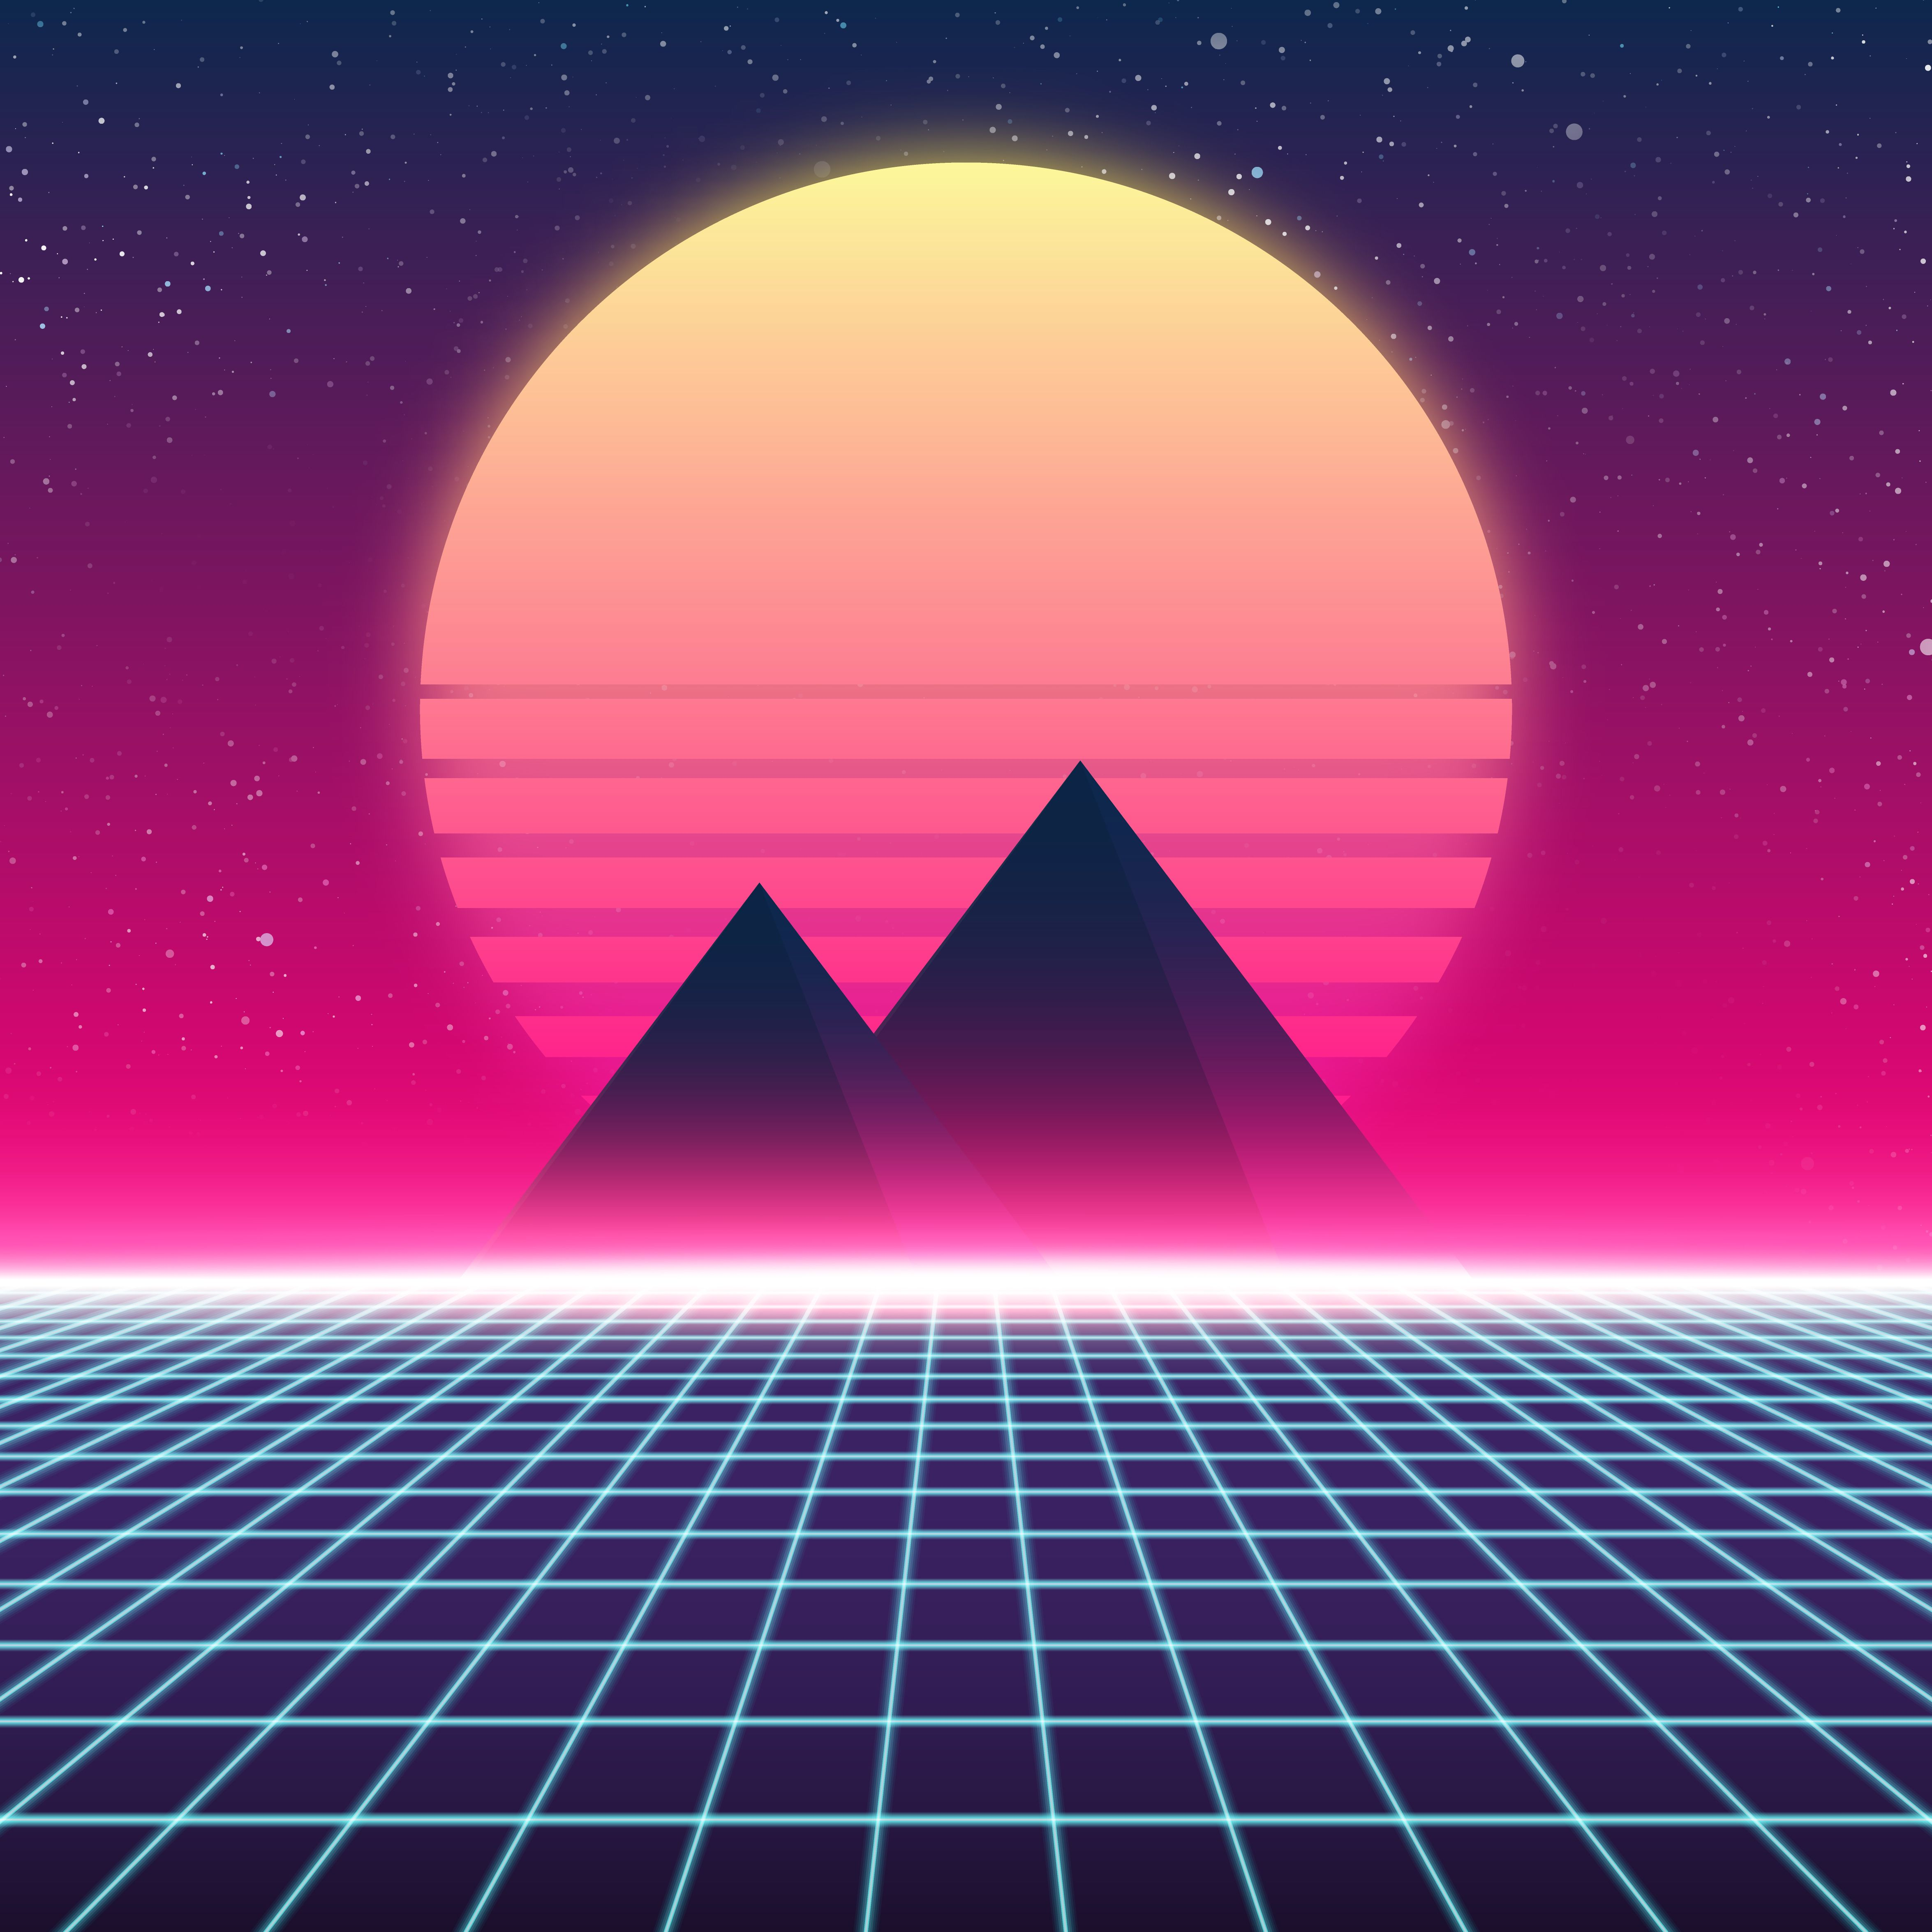 Synthwave Retro Design Pyramids And Sun Illustration Synthwave Synthwave Art Retro Futurism